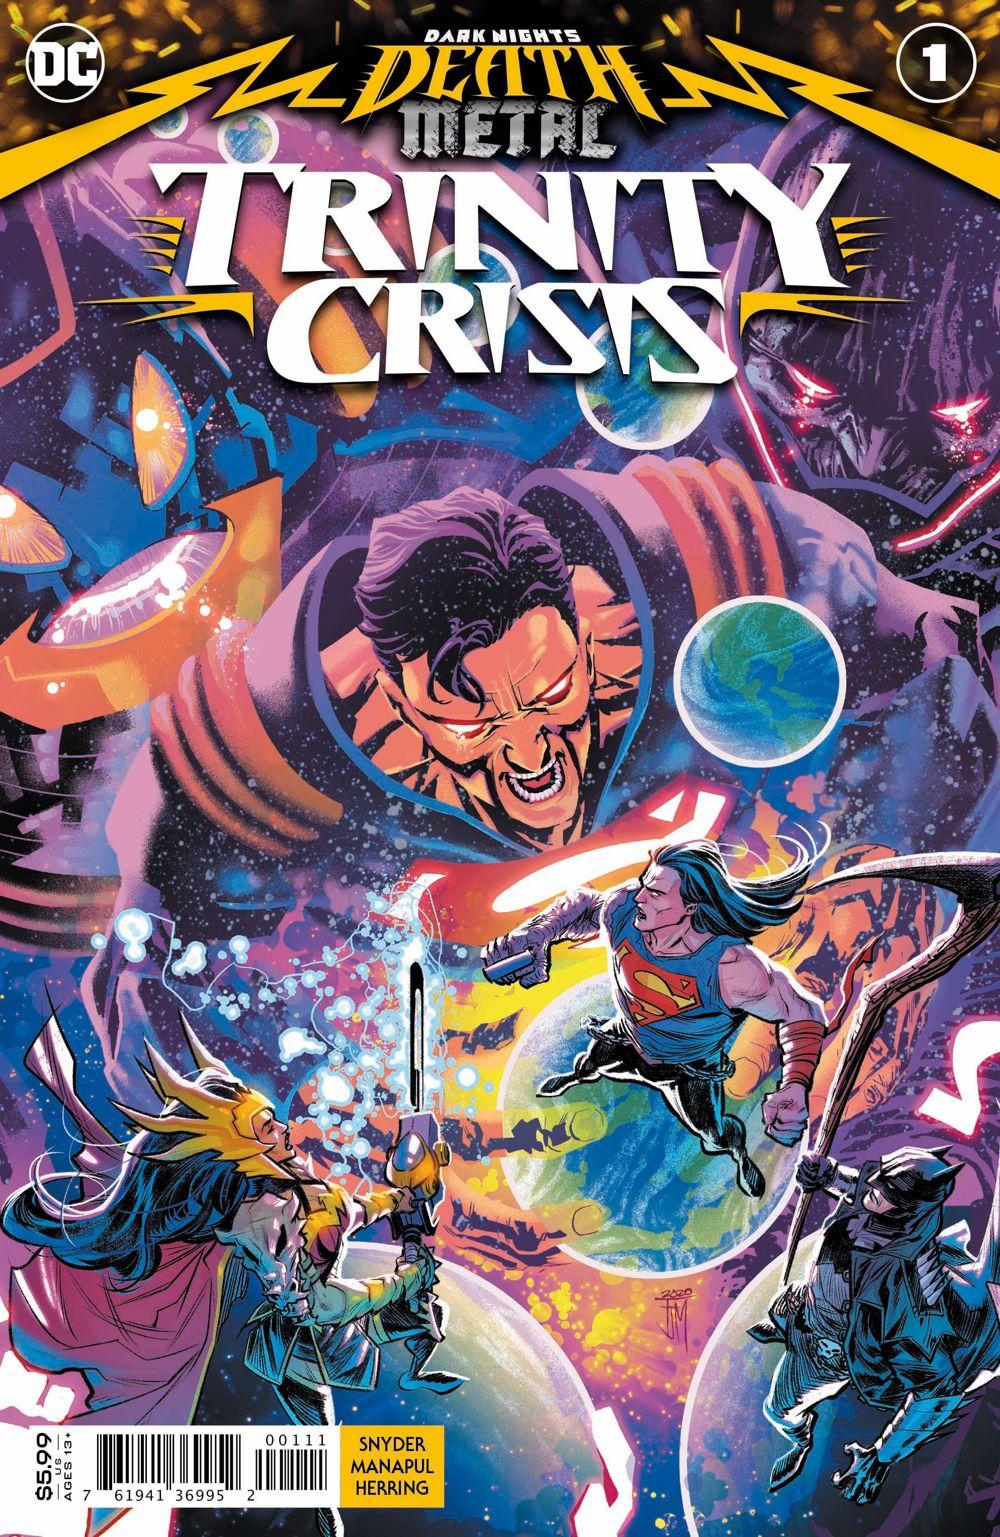 DNDM-TC-Cv1 ComicList Previews: DARK NIGHTS DEATH METAL TRINITY CRISIS #1